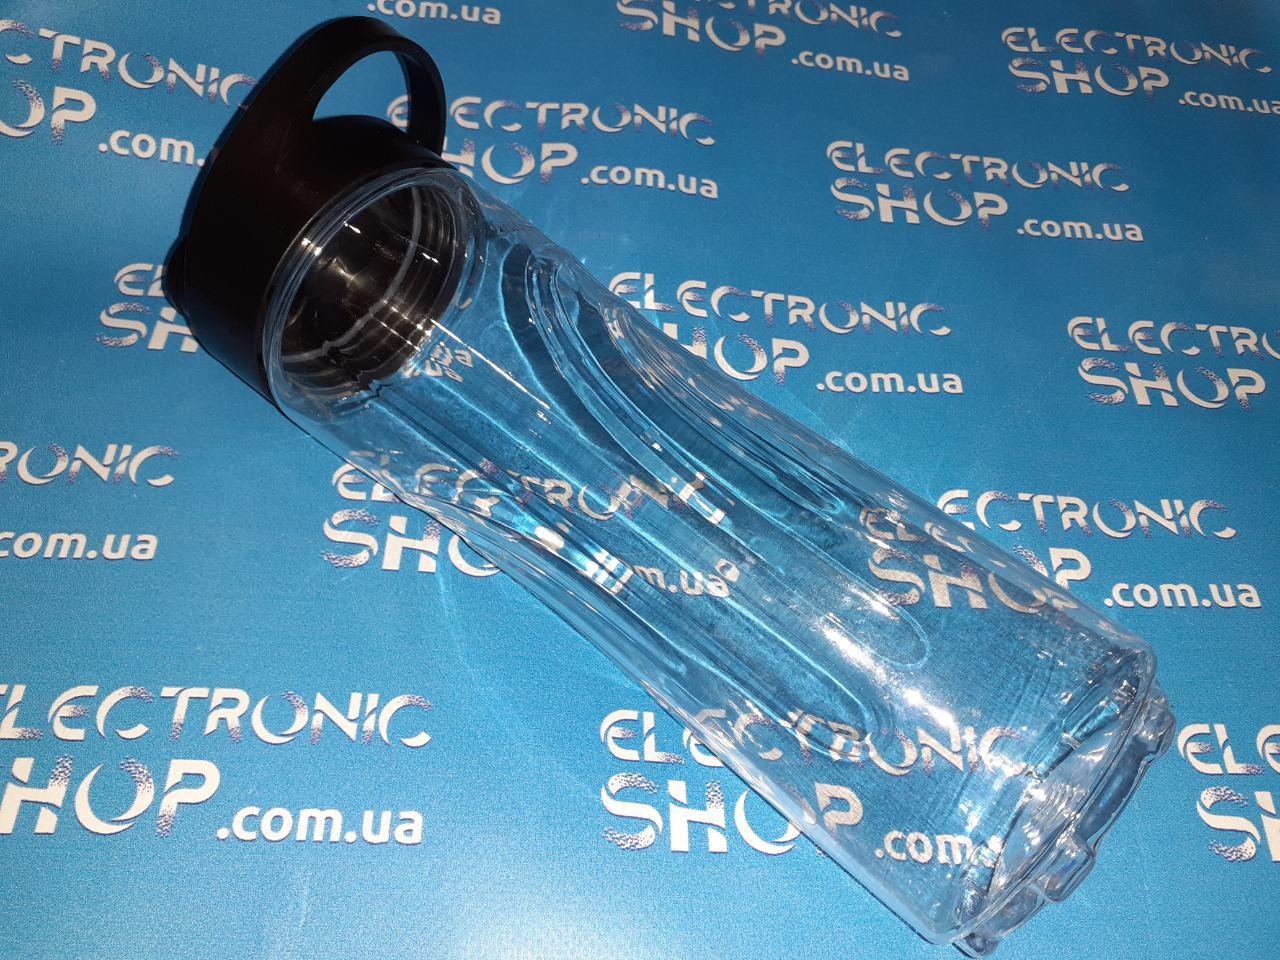 Фітнес пляшка чаша блендера Kealive LB-2109